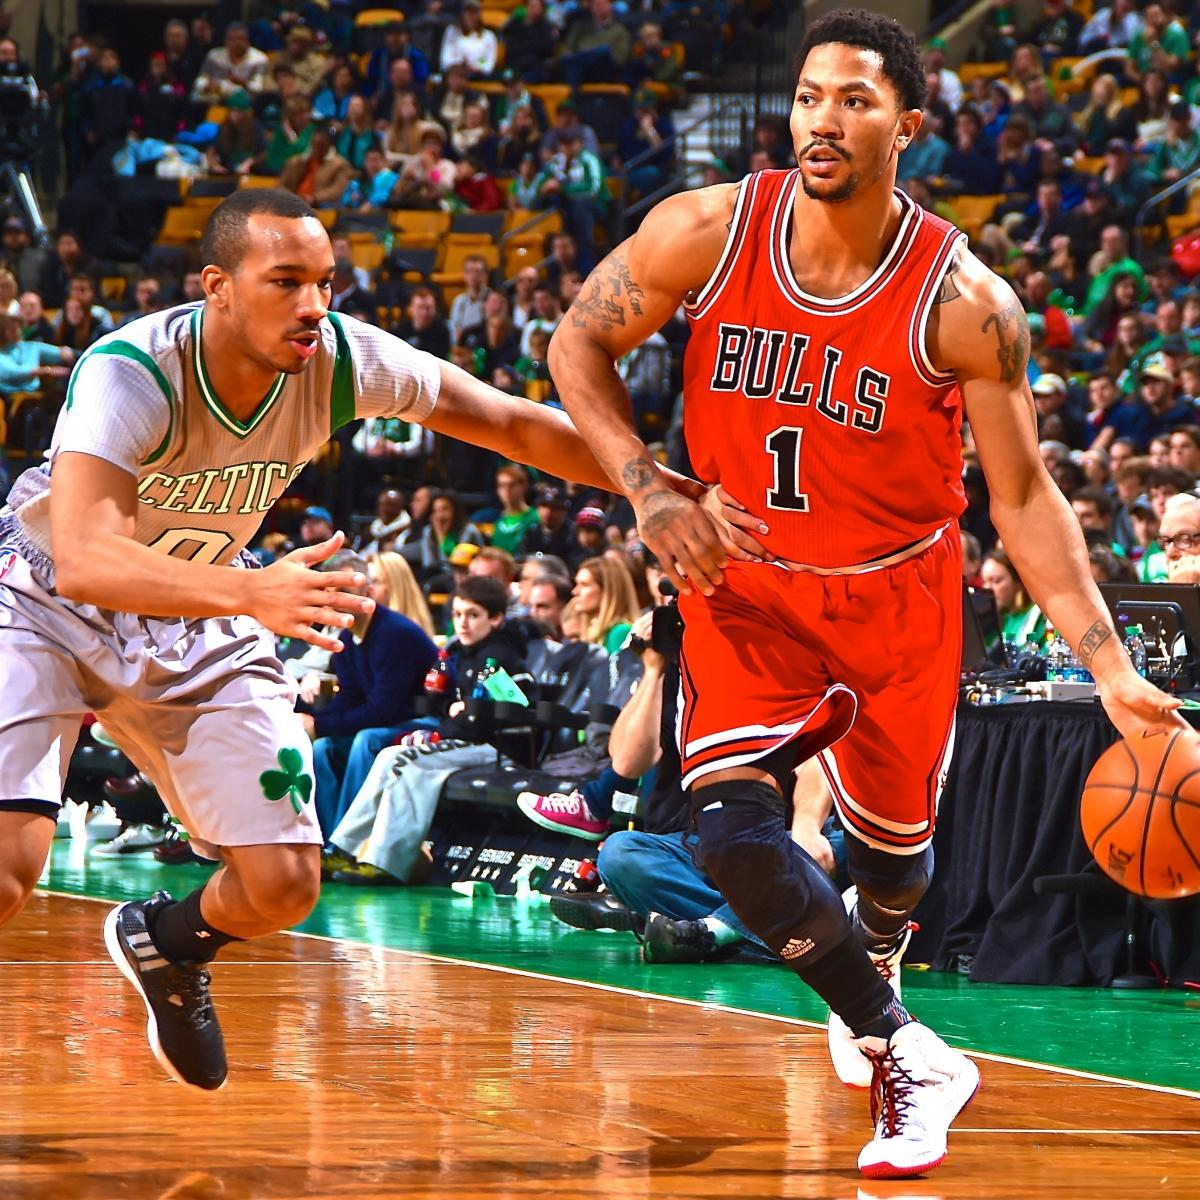 Chicago Bulls Vs. Boston Celtics 11/28/14: Video